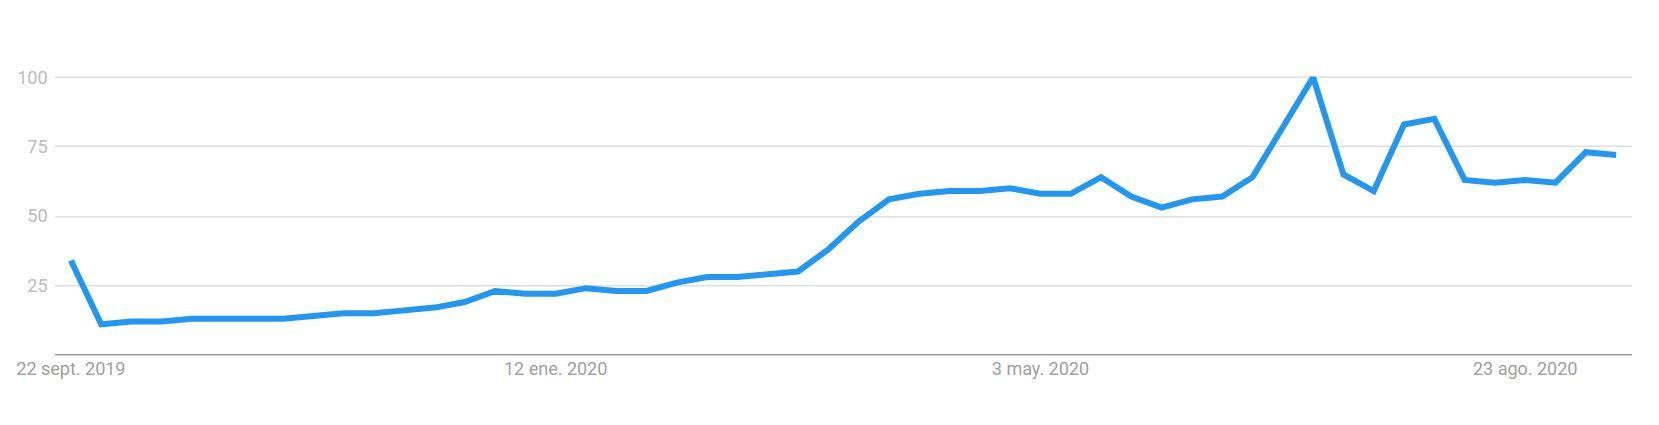 Tiktok Google Trends